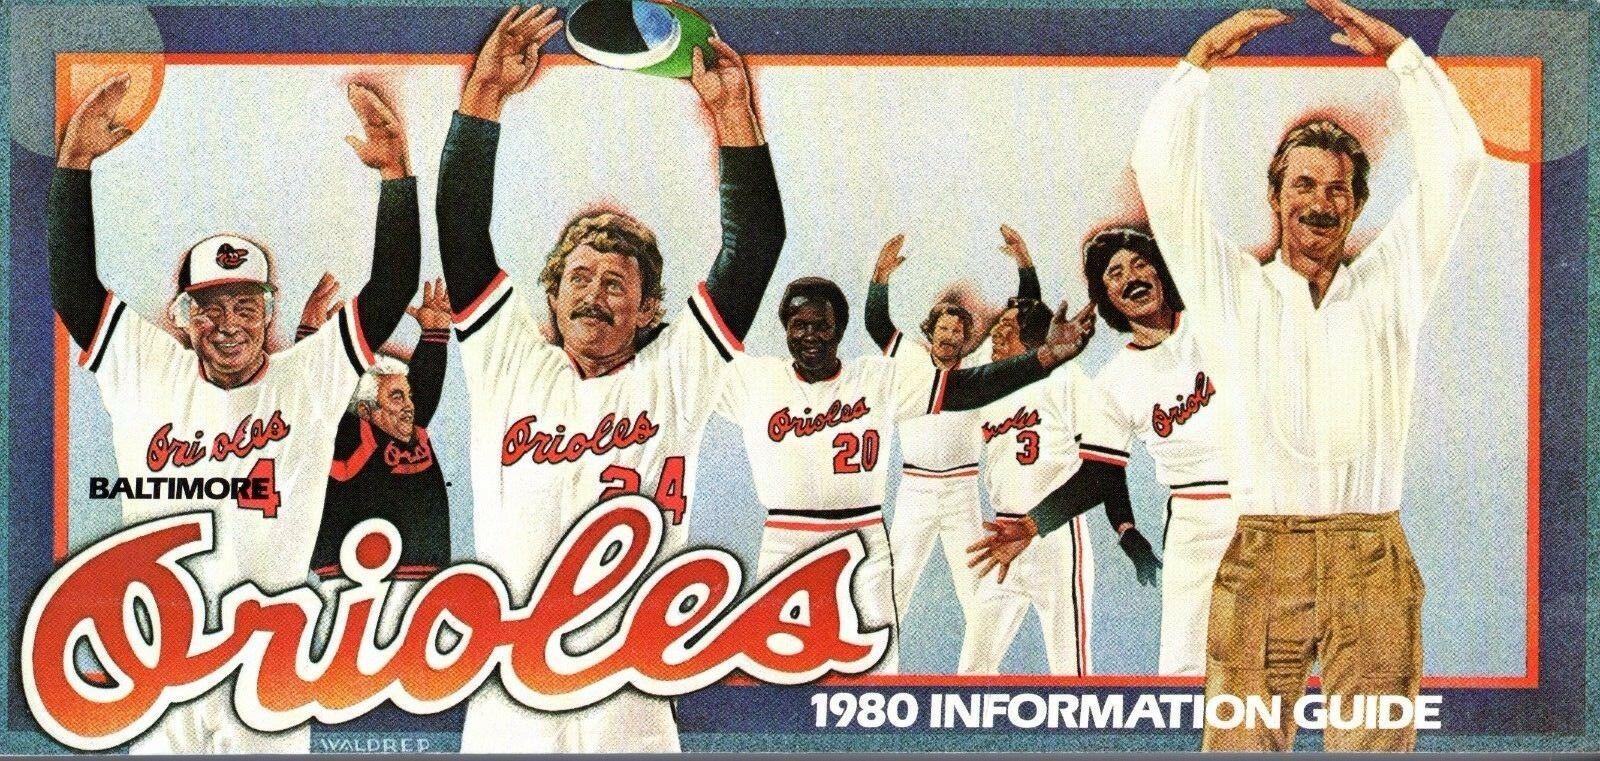 1980 Baltimore Orioles media guide